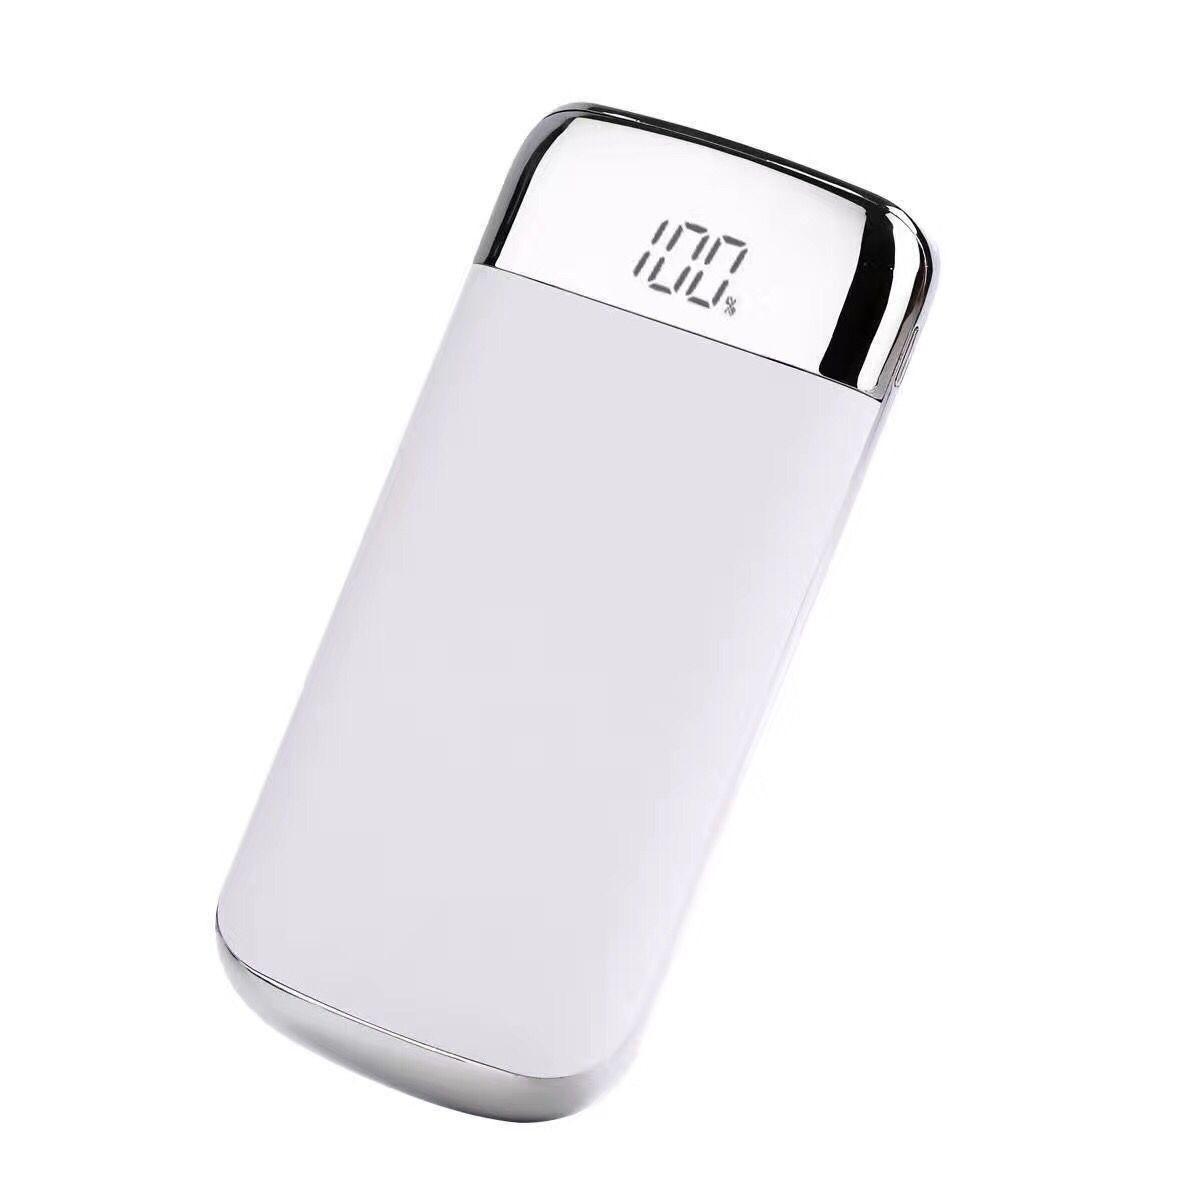 zarjadnoe power bank 10000 mach my10 17 - Зарядное-Power Bank 10000 мАч MY10: 2 USB, ЖК-экран, фонарик